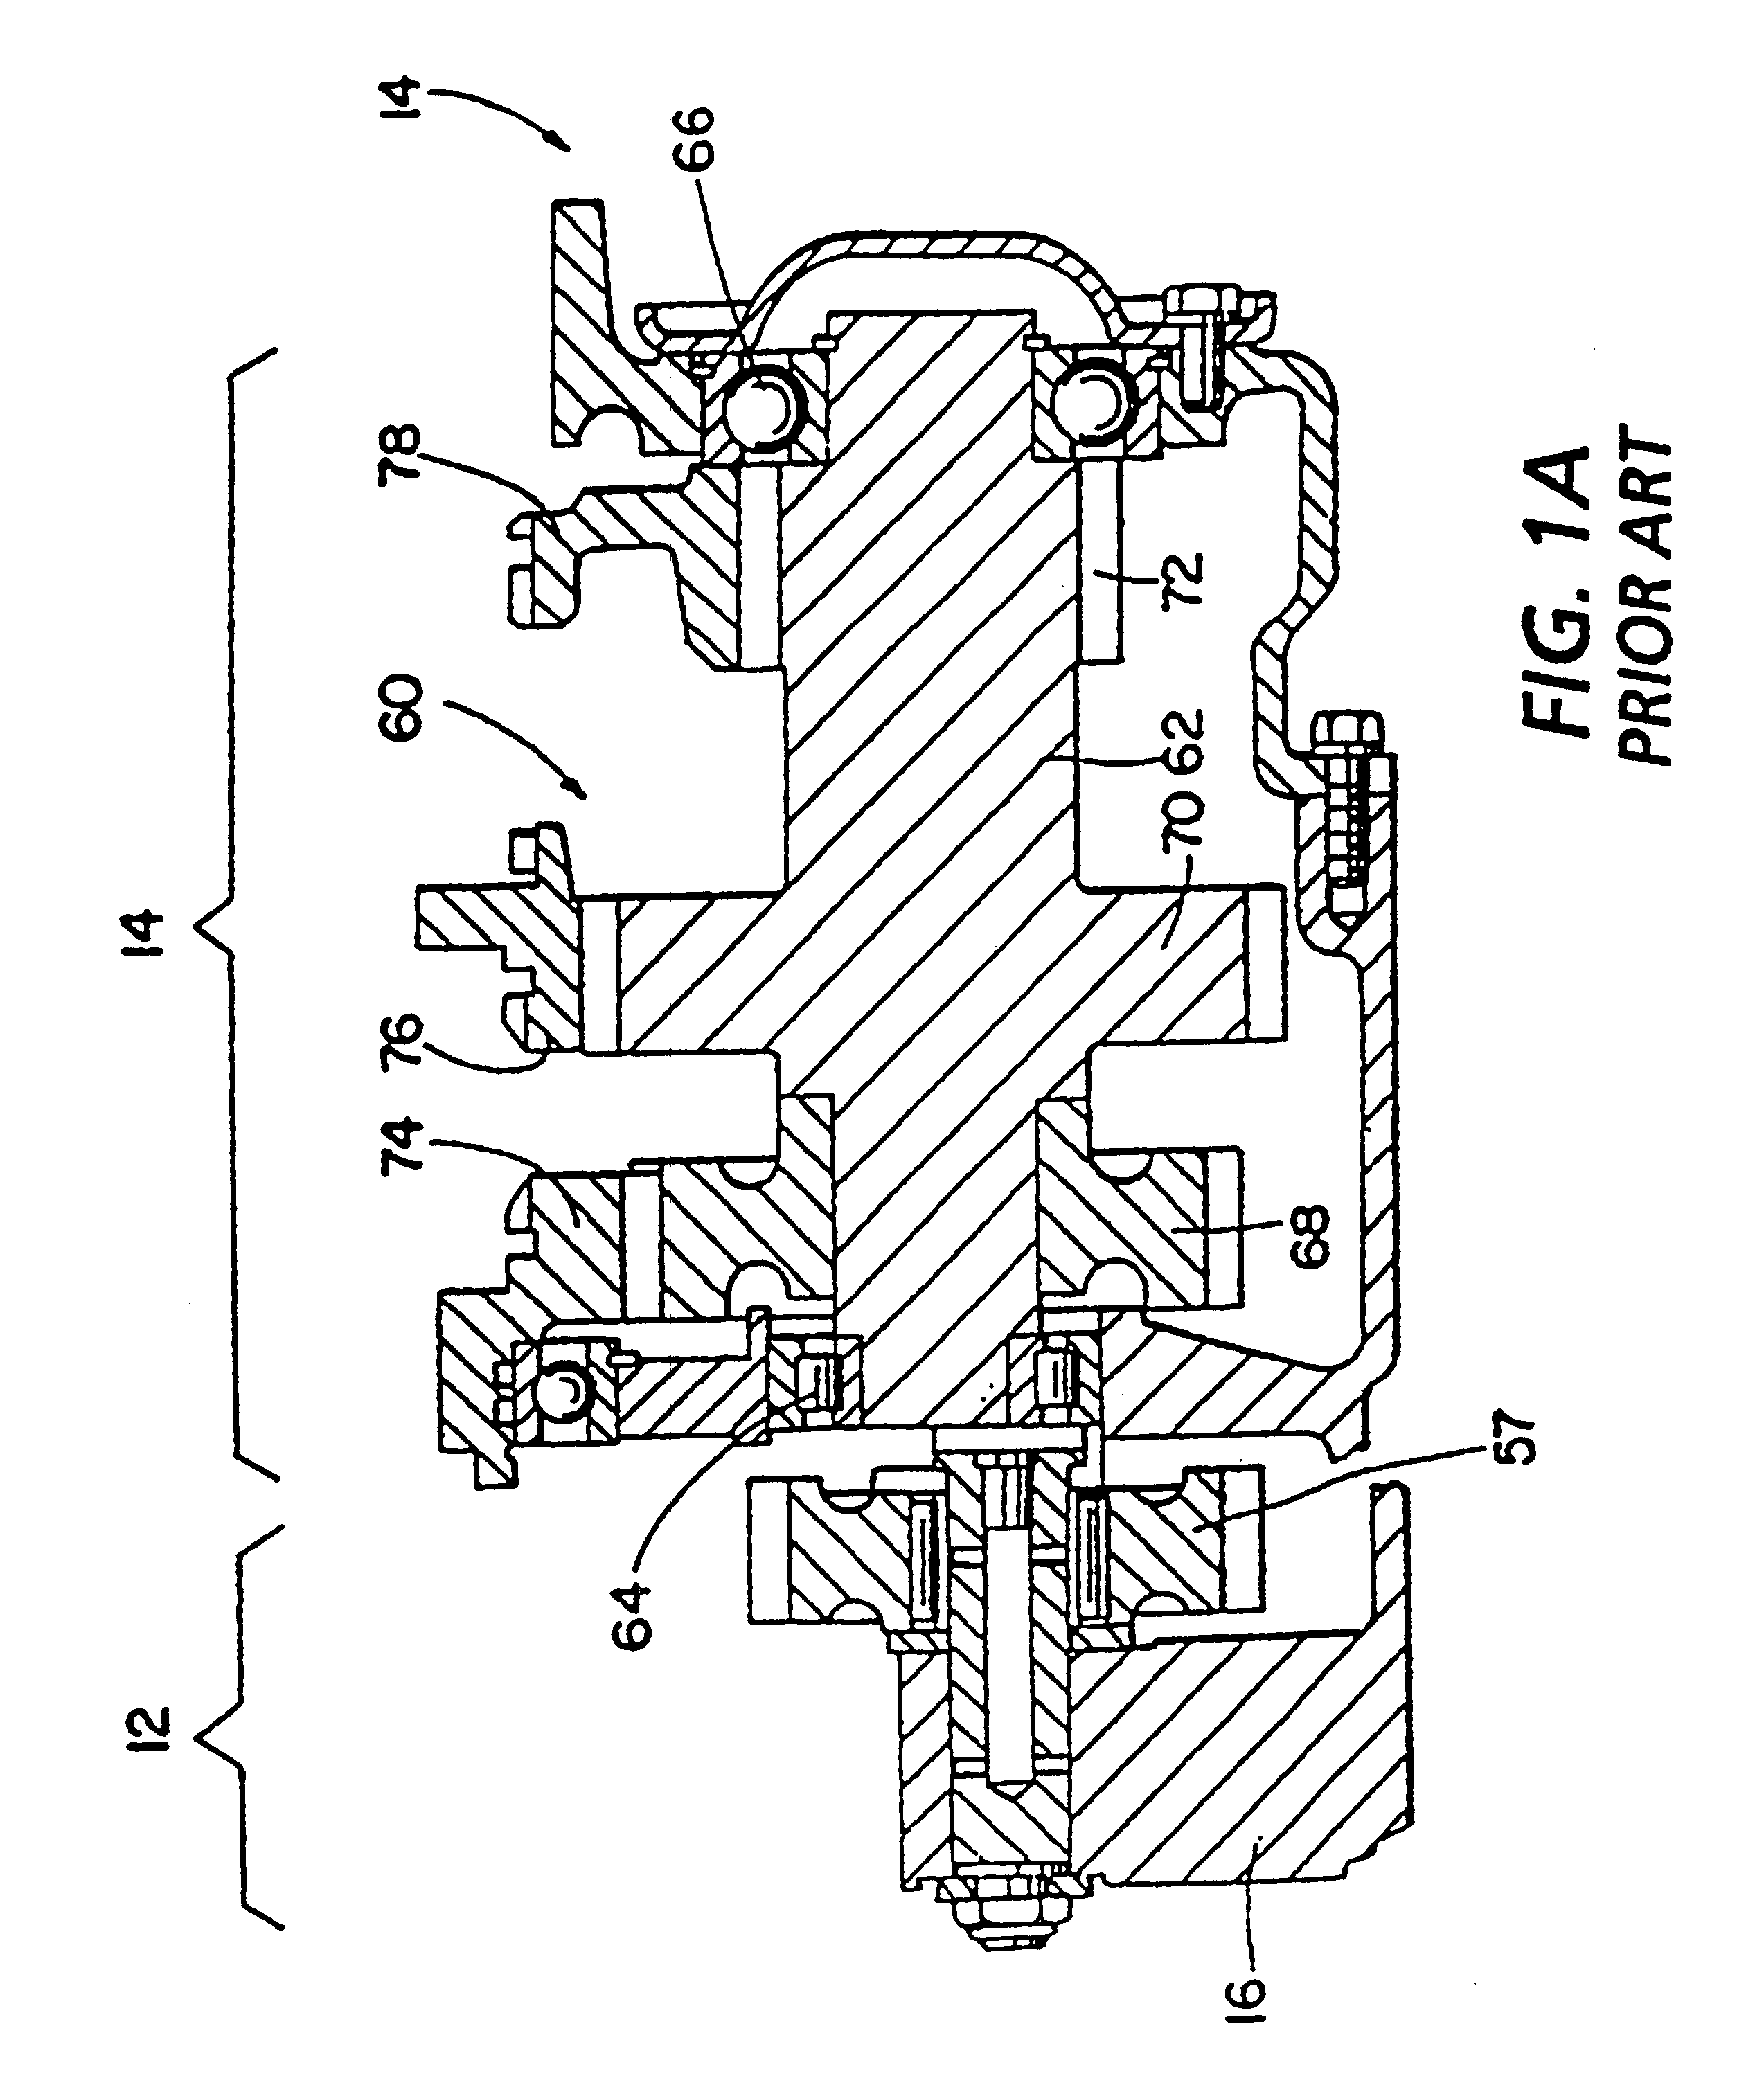 2007 dodge nitro wiring harness diagram